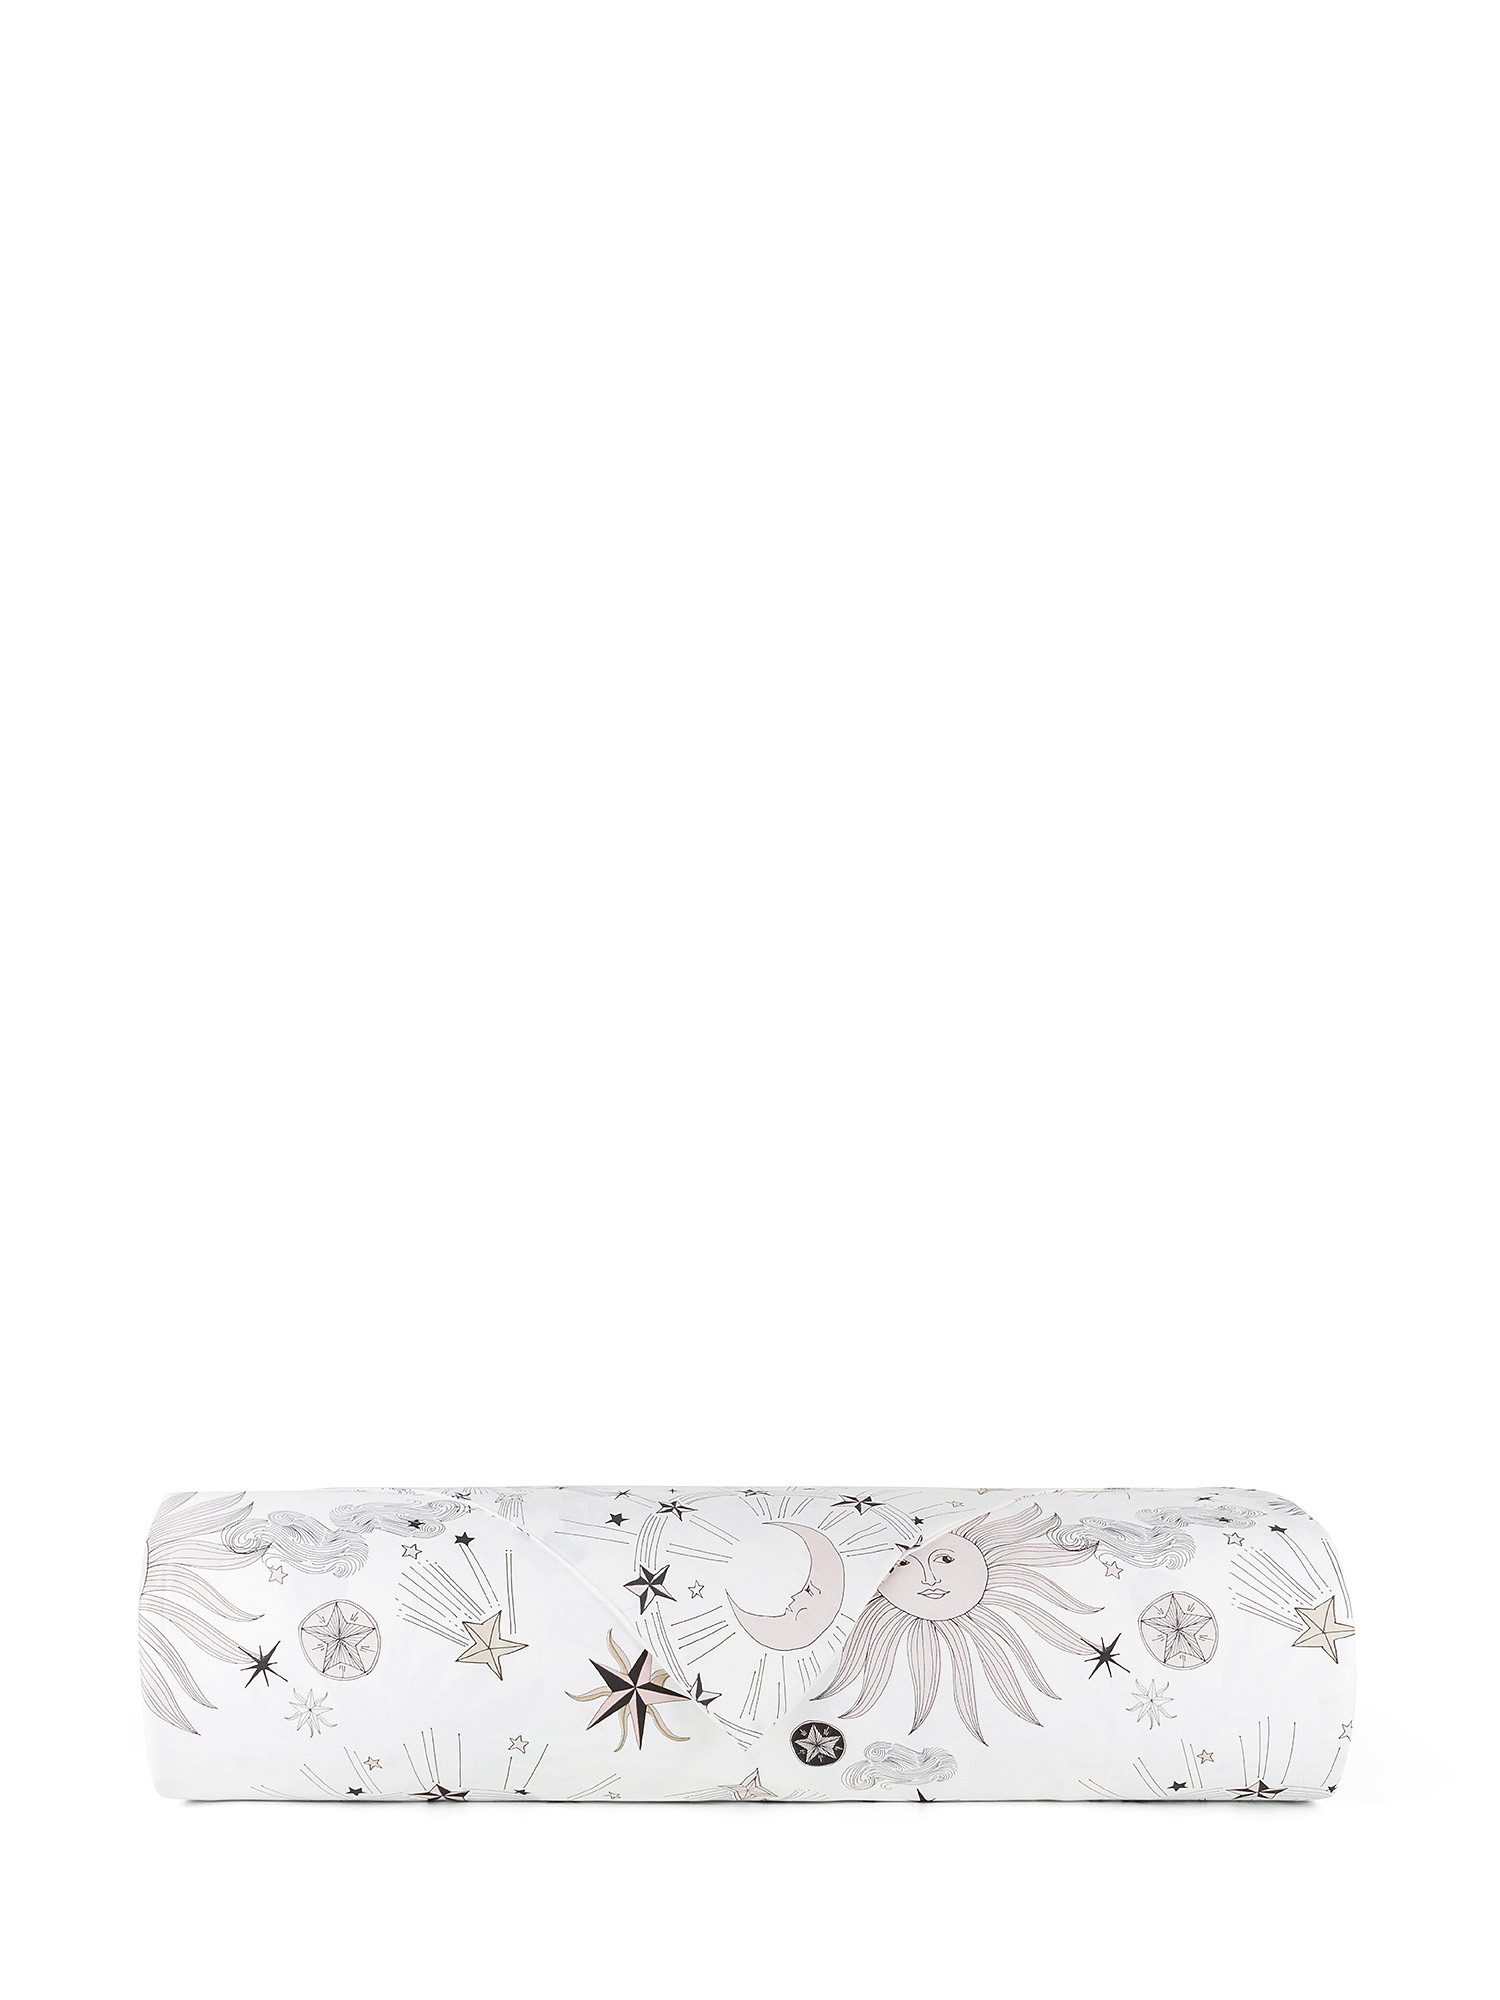 Copripiumino raso di cotone fantasia sole e luna, Bianco, large image number 1